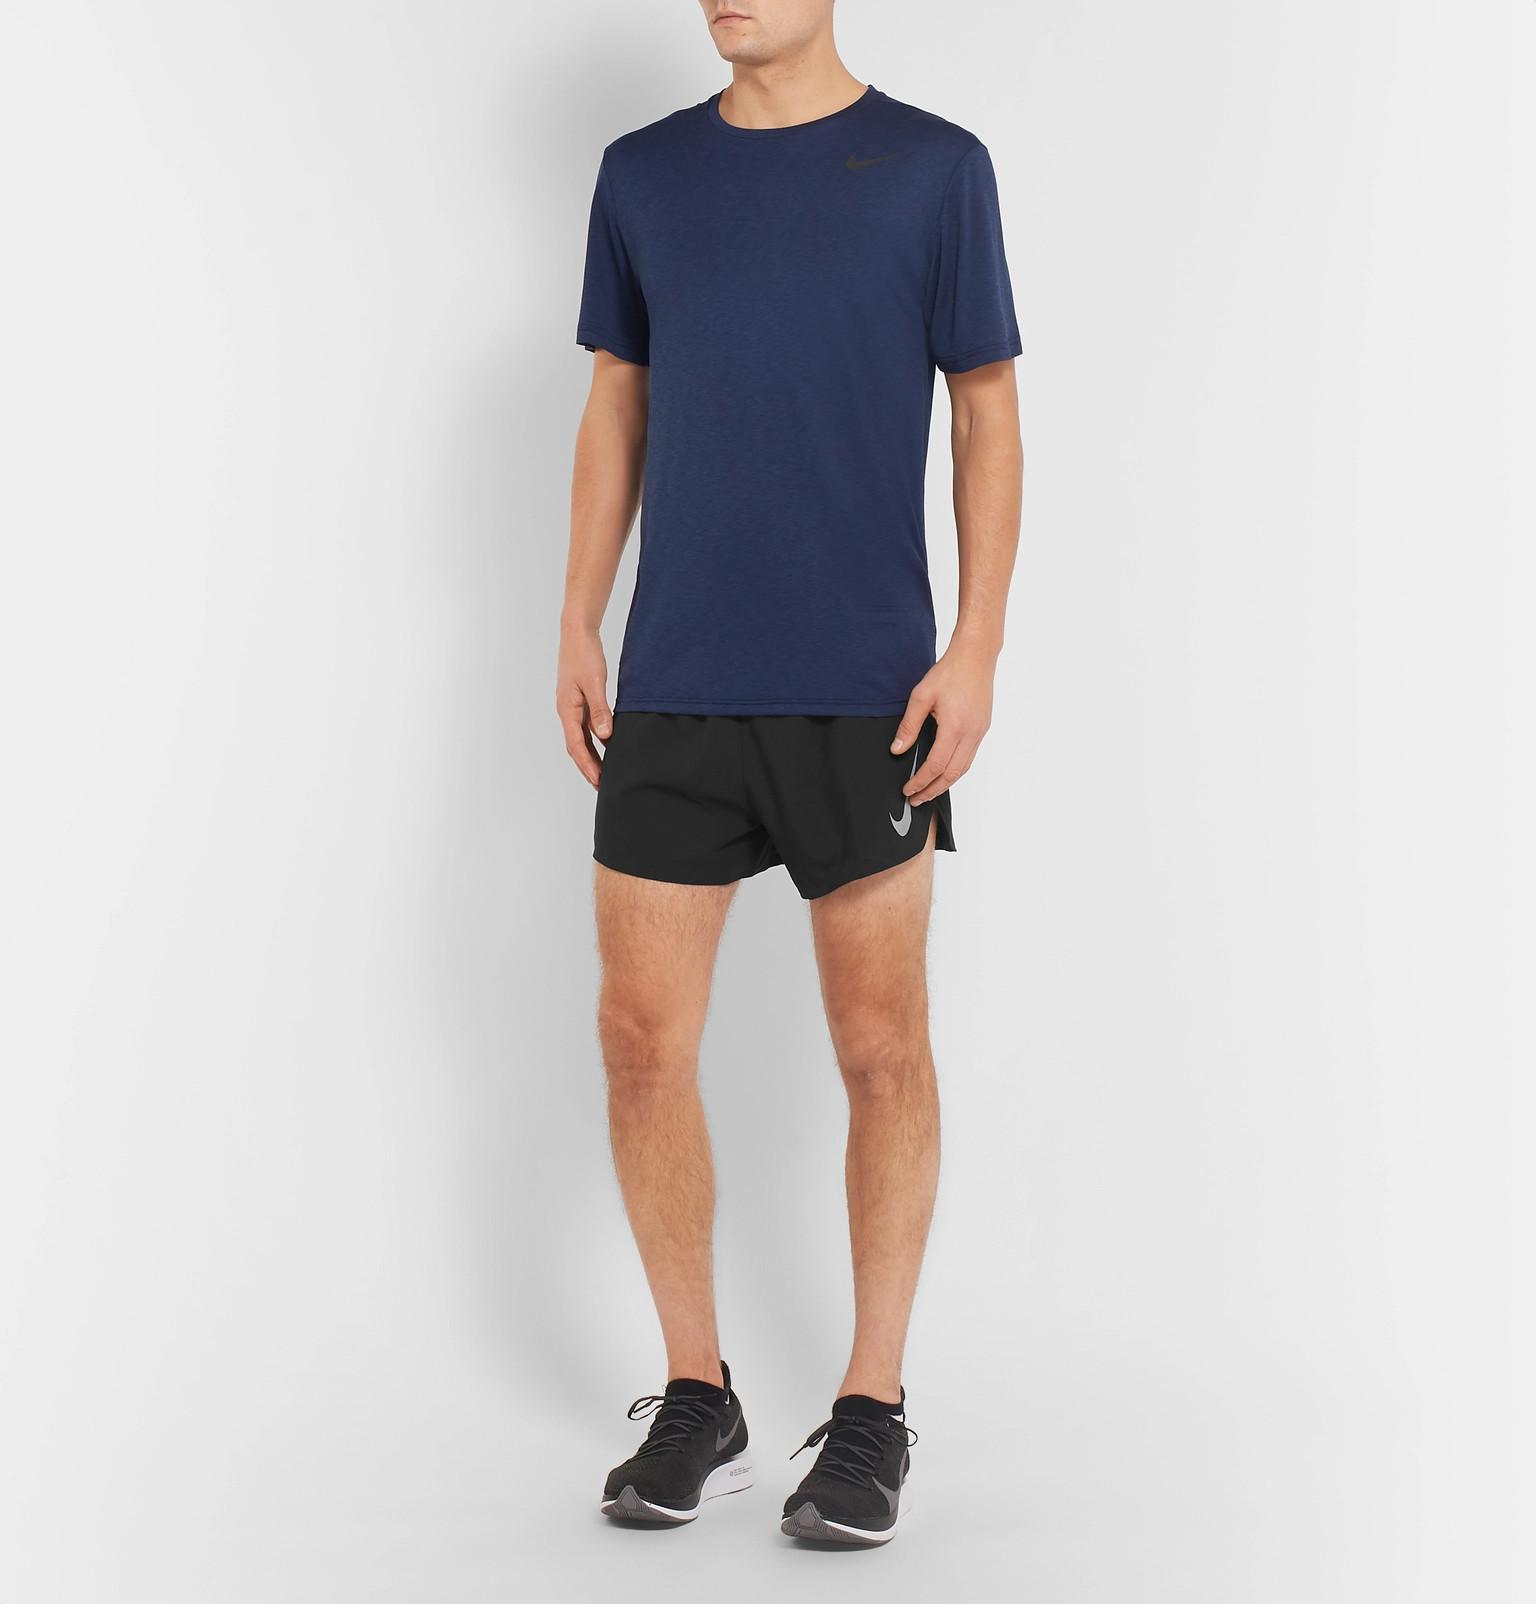 e9c6a995a0277 Nike - Black Aeroswift Shorts for Men - Lyst. View fullscreen